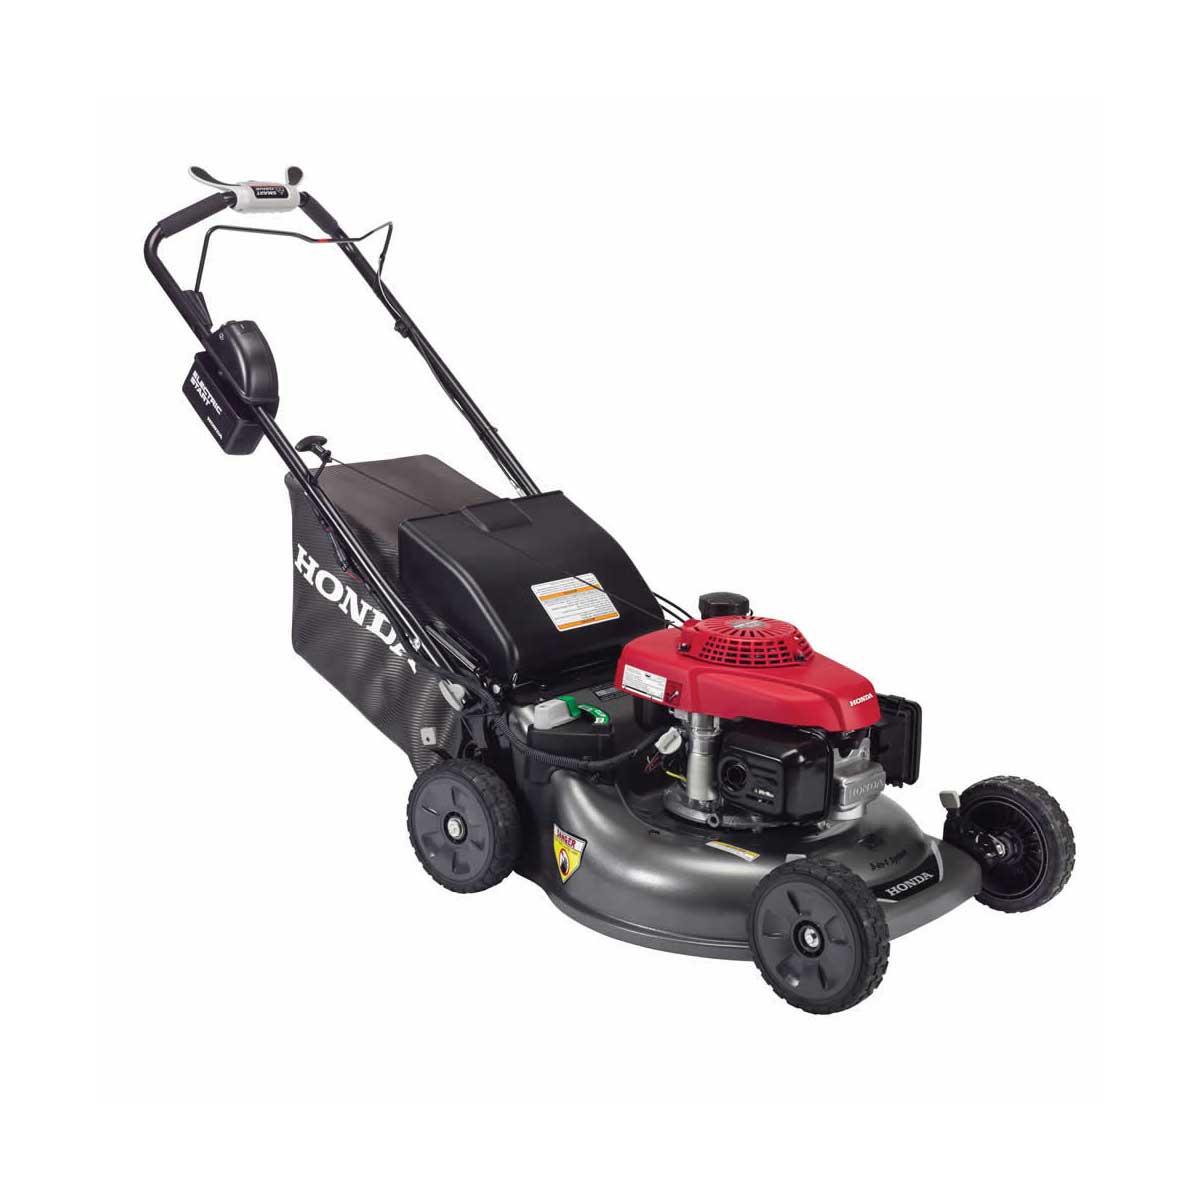 Honda Lawnmower HRR216VLA